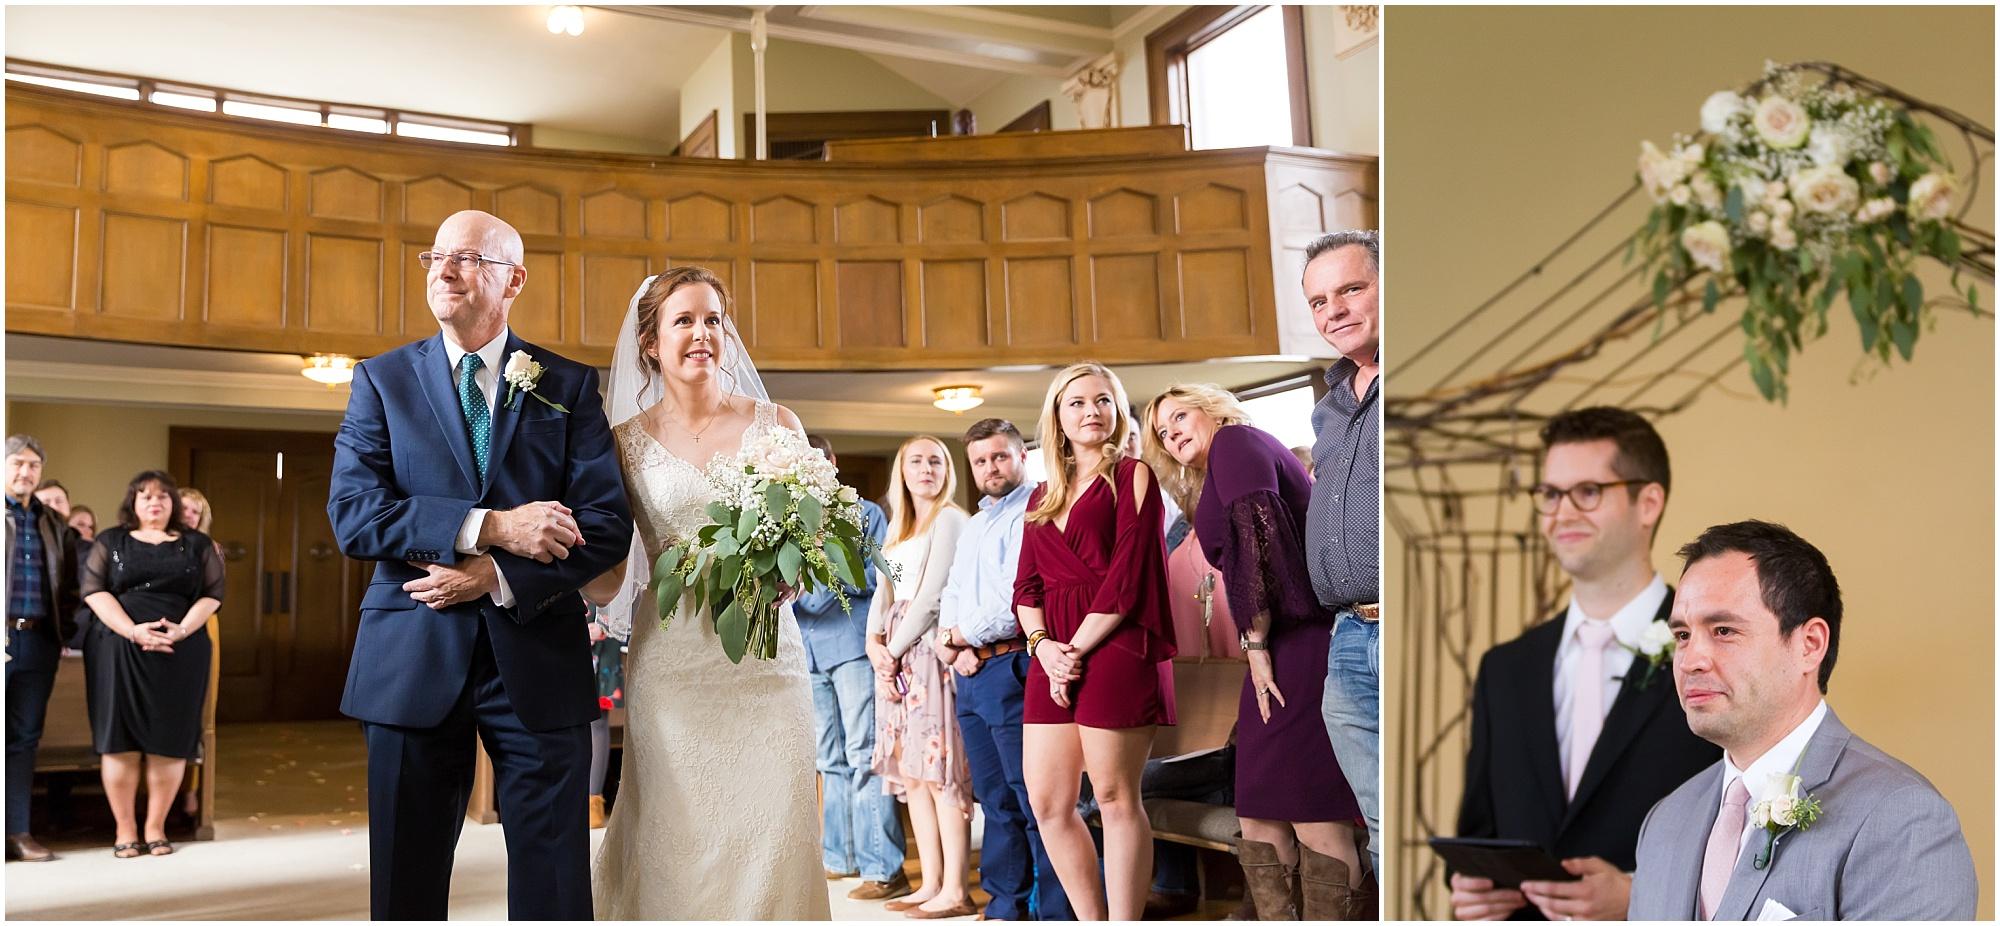 Downtown-Waco-Fall-Wedding_0011.jpg